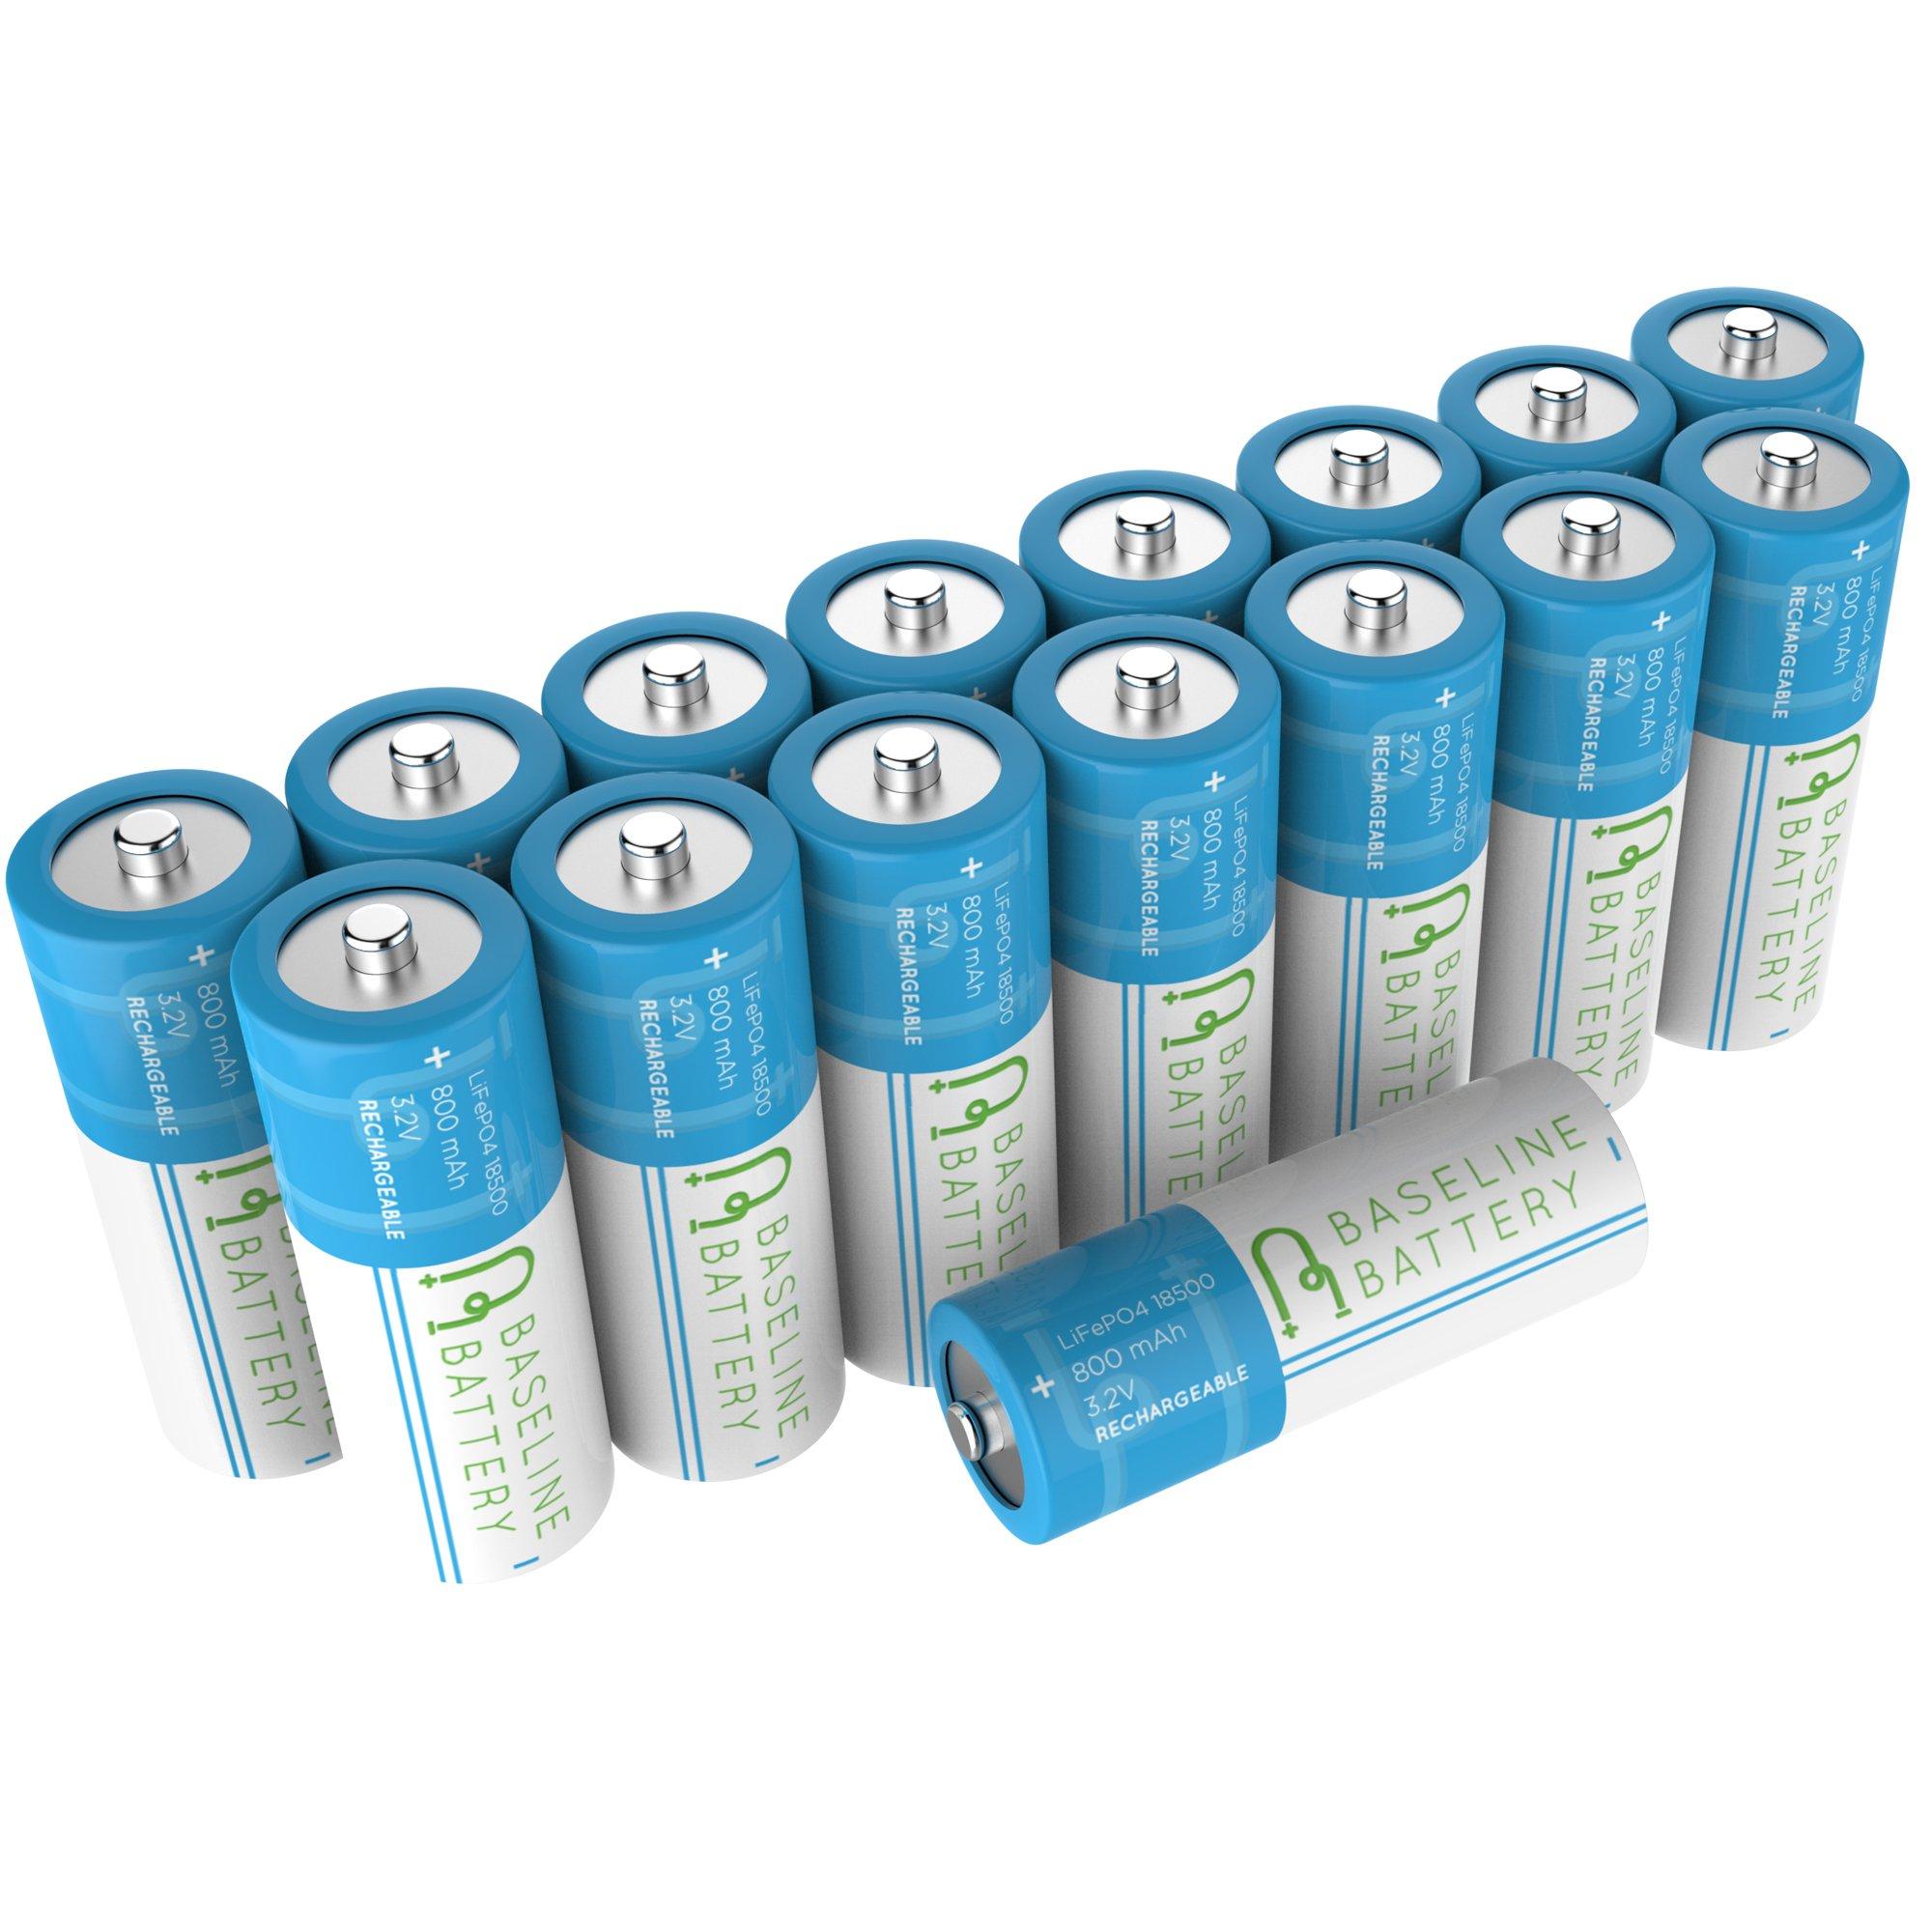 16 Baseline Battery 800 mAh IFR 18500 3.2v LiFePO4 Lithium Phosphate Rechargeable Batteries Solar Garden Light